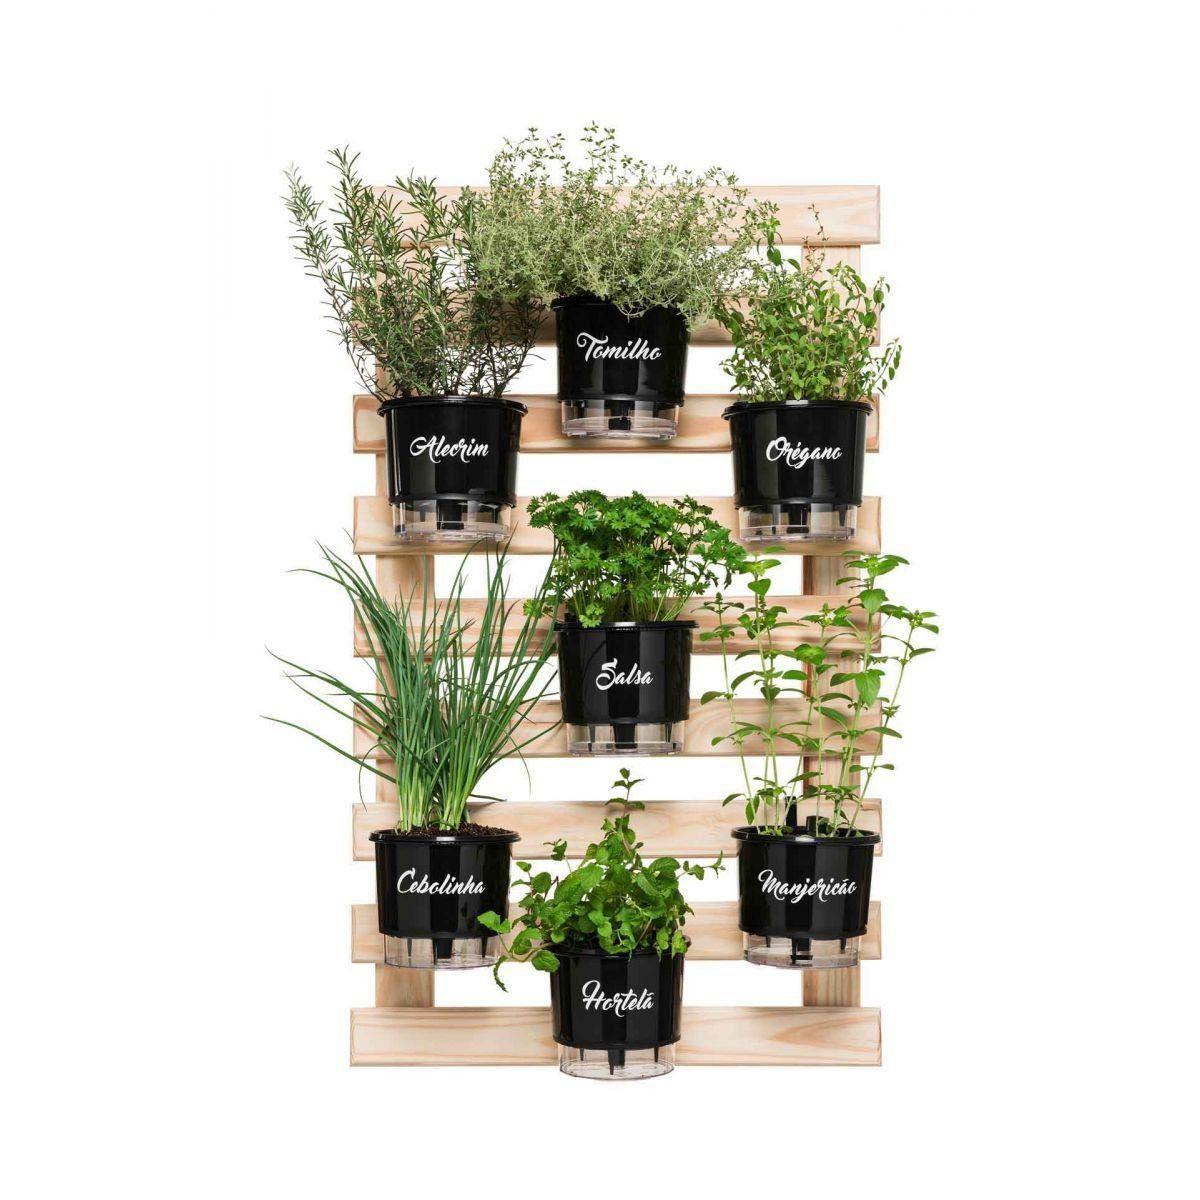 Kit Horta Vertical Gourmet 100cm x 60cm com treliça, vasos e suportes